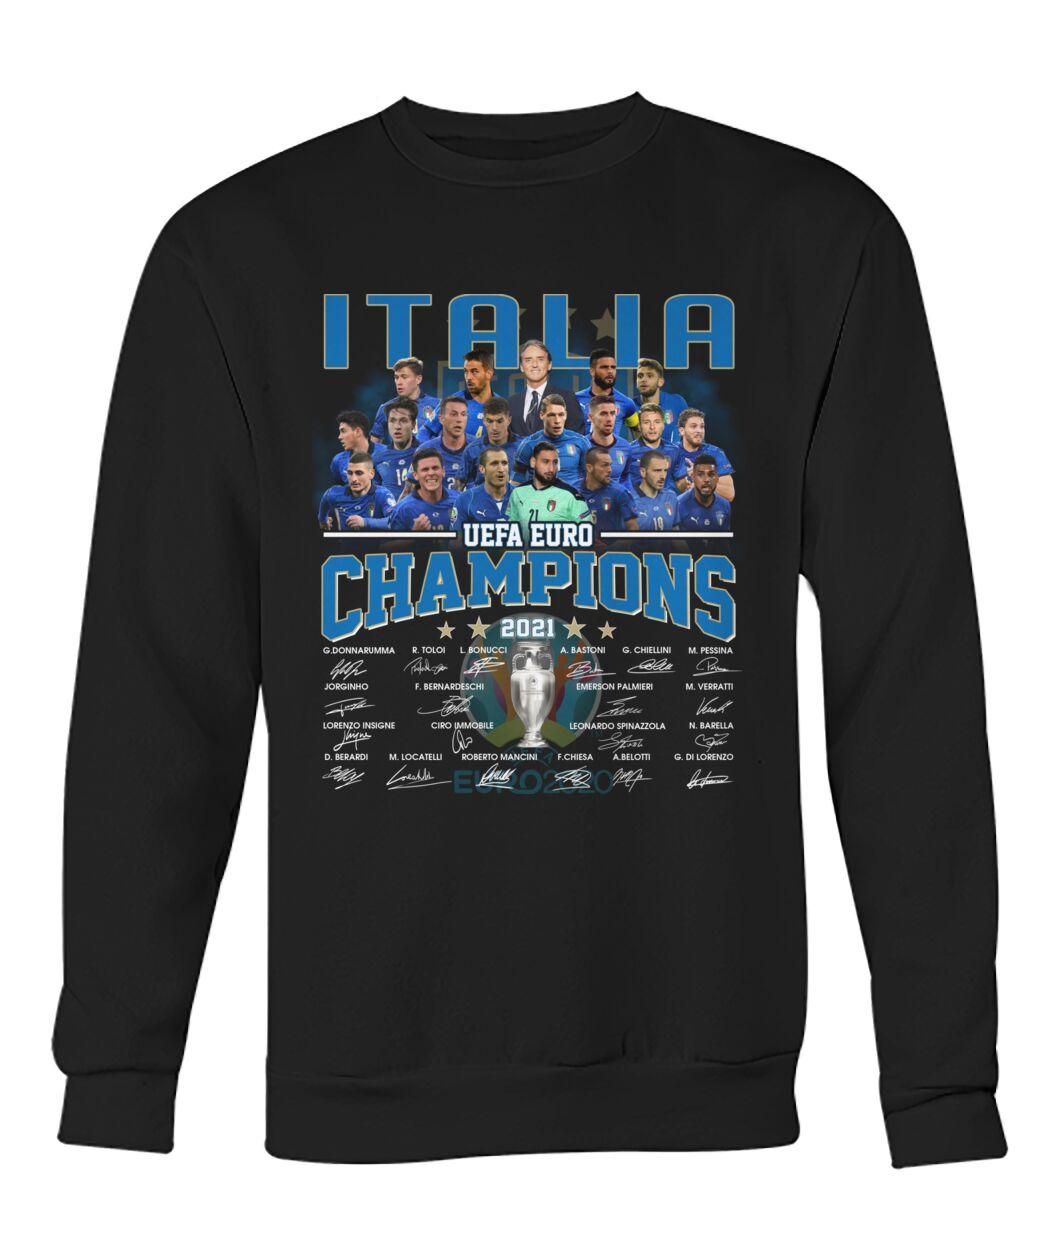 Italia UEFA Euro Champions signatures shirt hoodie 11